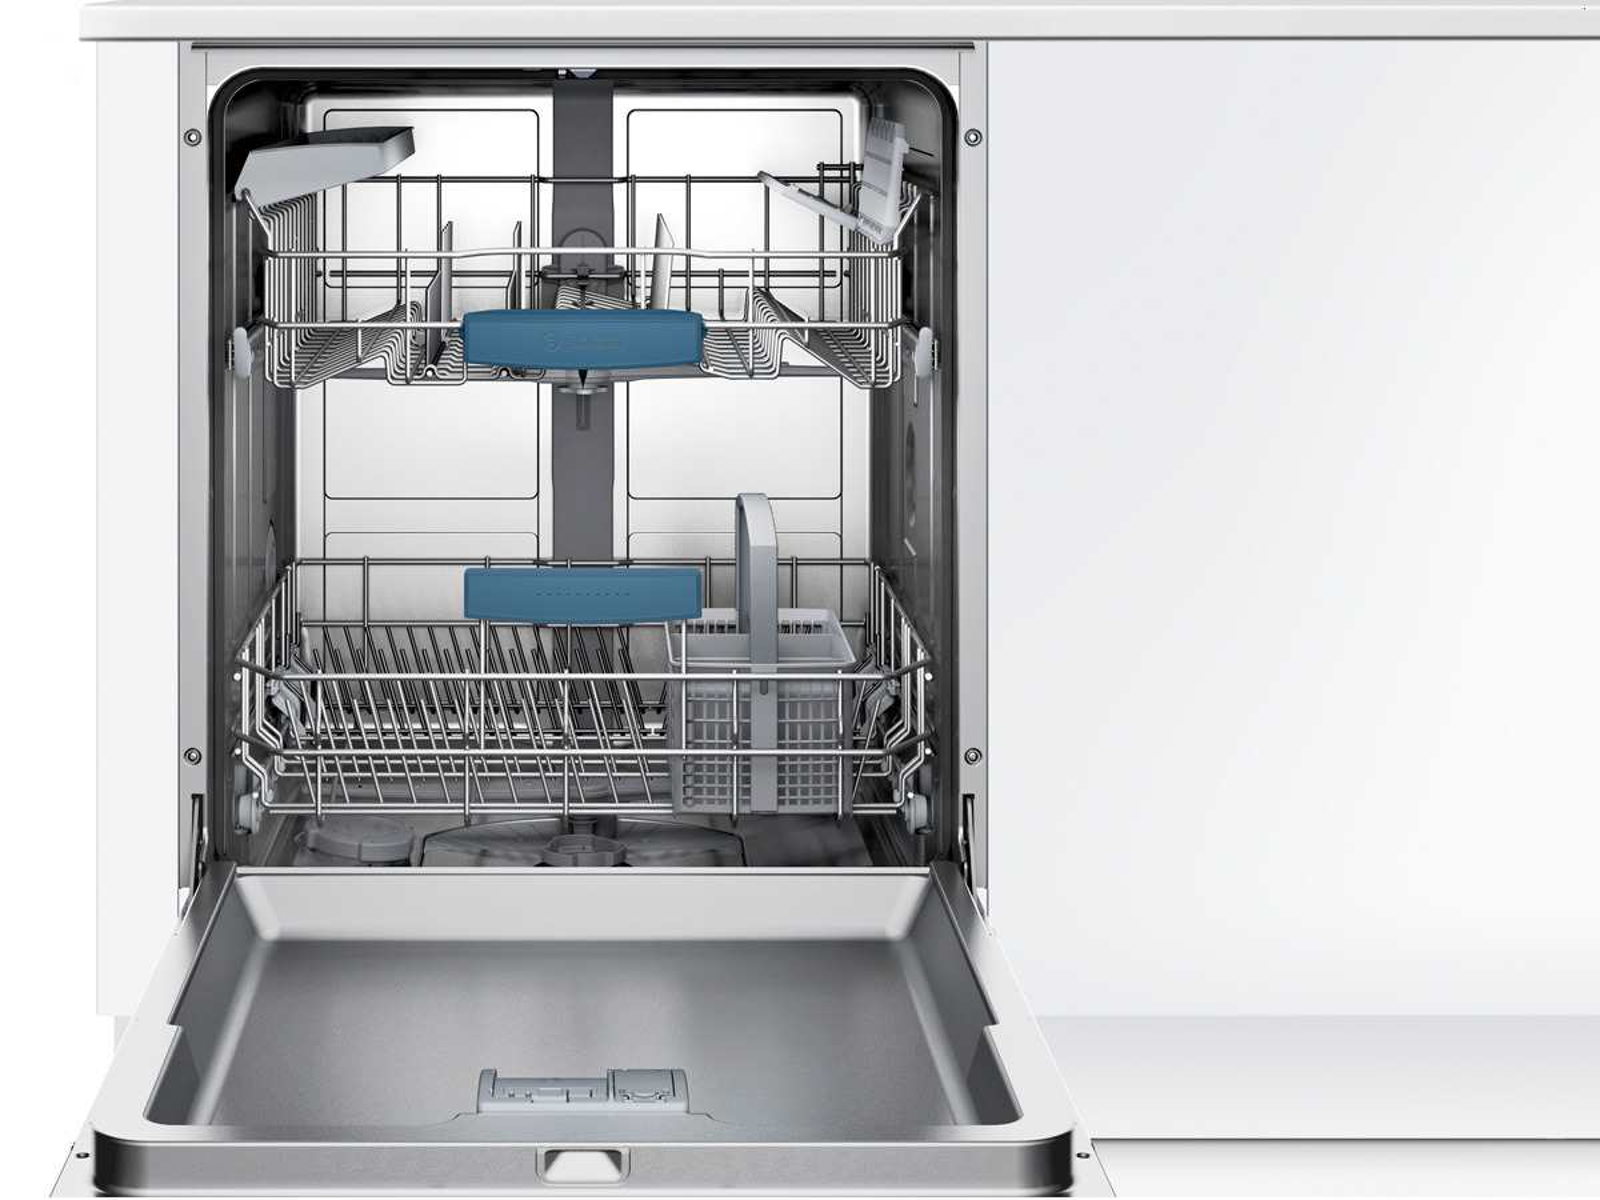 Bosch Smu63m85eu Unterbau Geschirrspüler Edelstahl Ebay